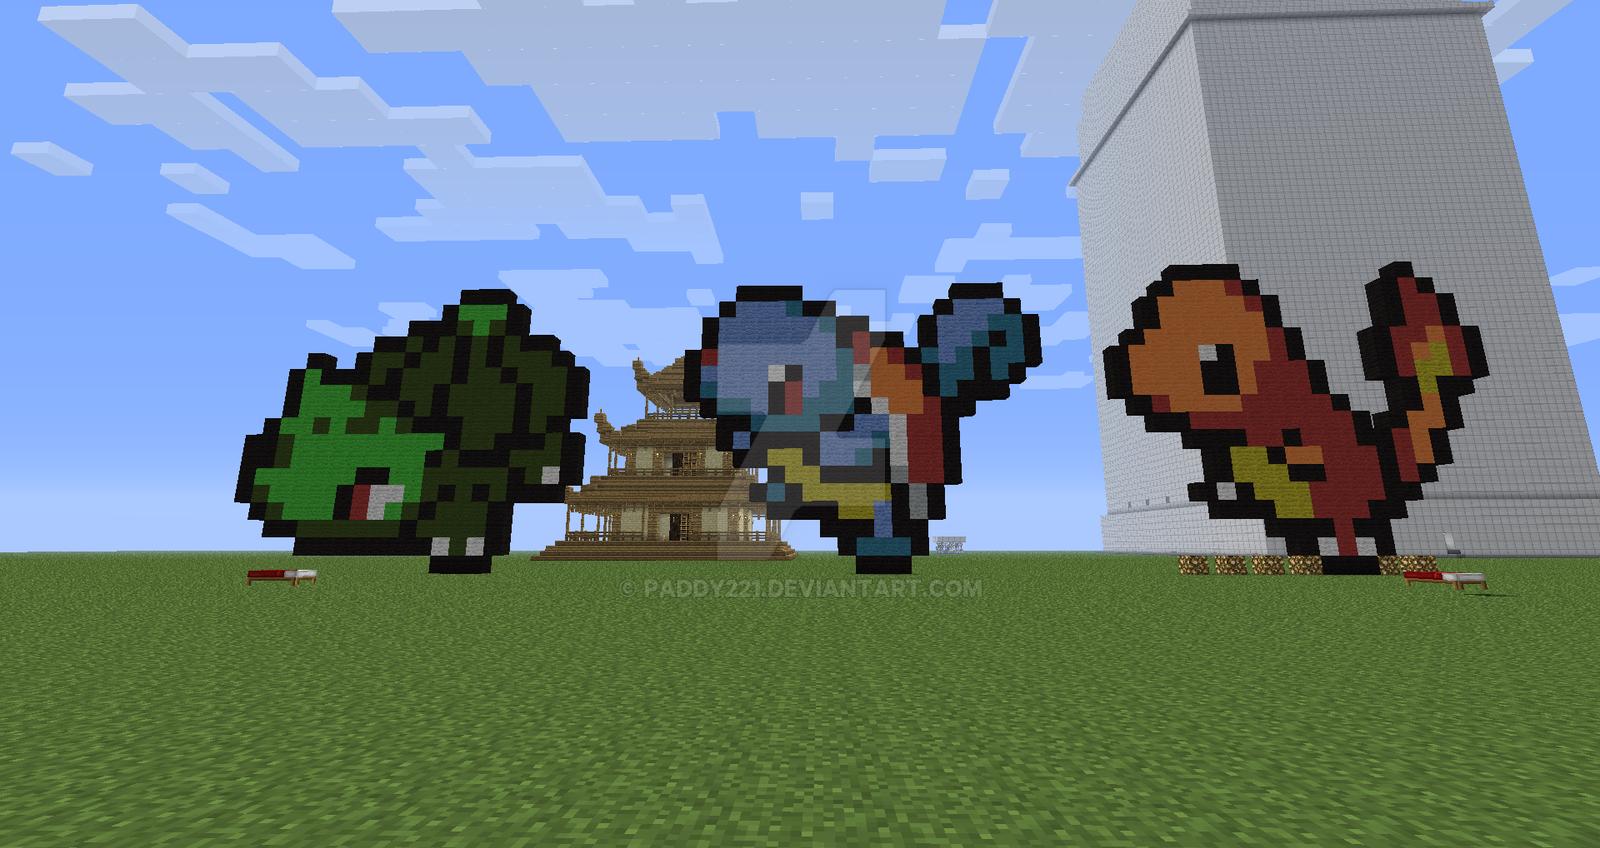 Pokemon Original Starters In Minecraft Pixel Art By Paddy221 On